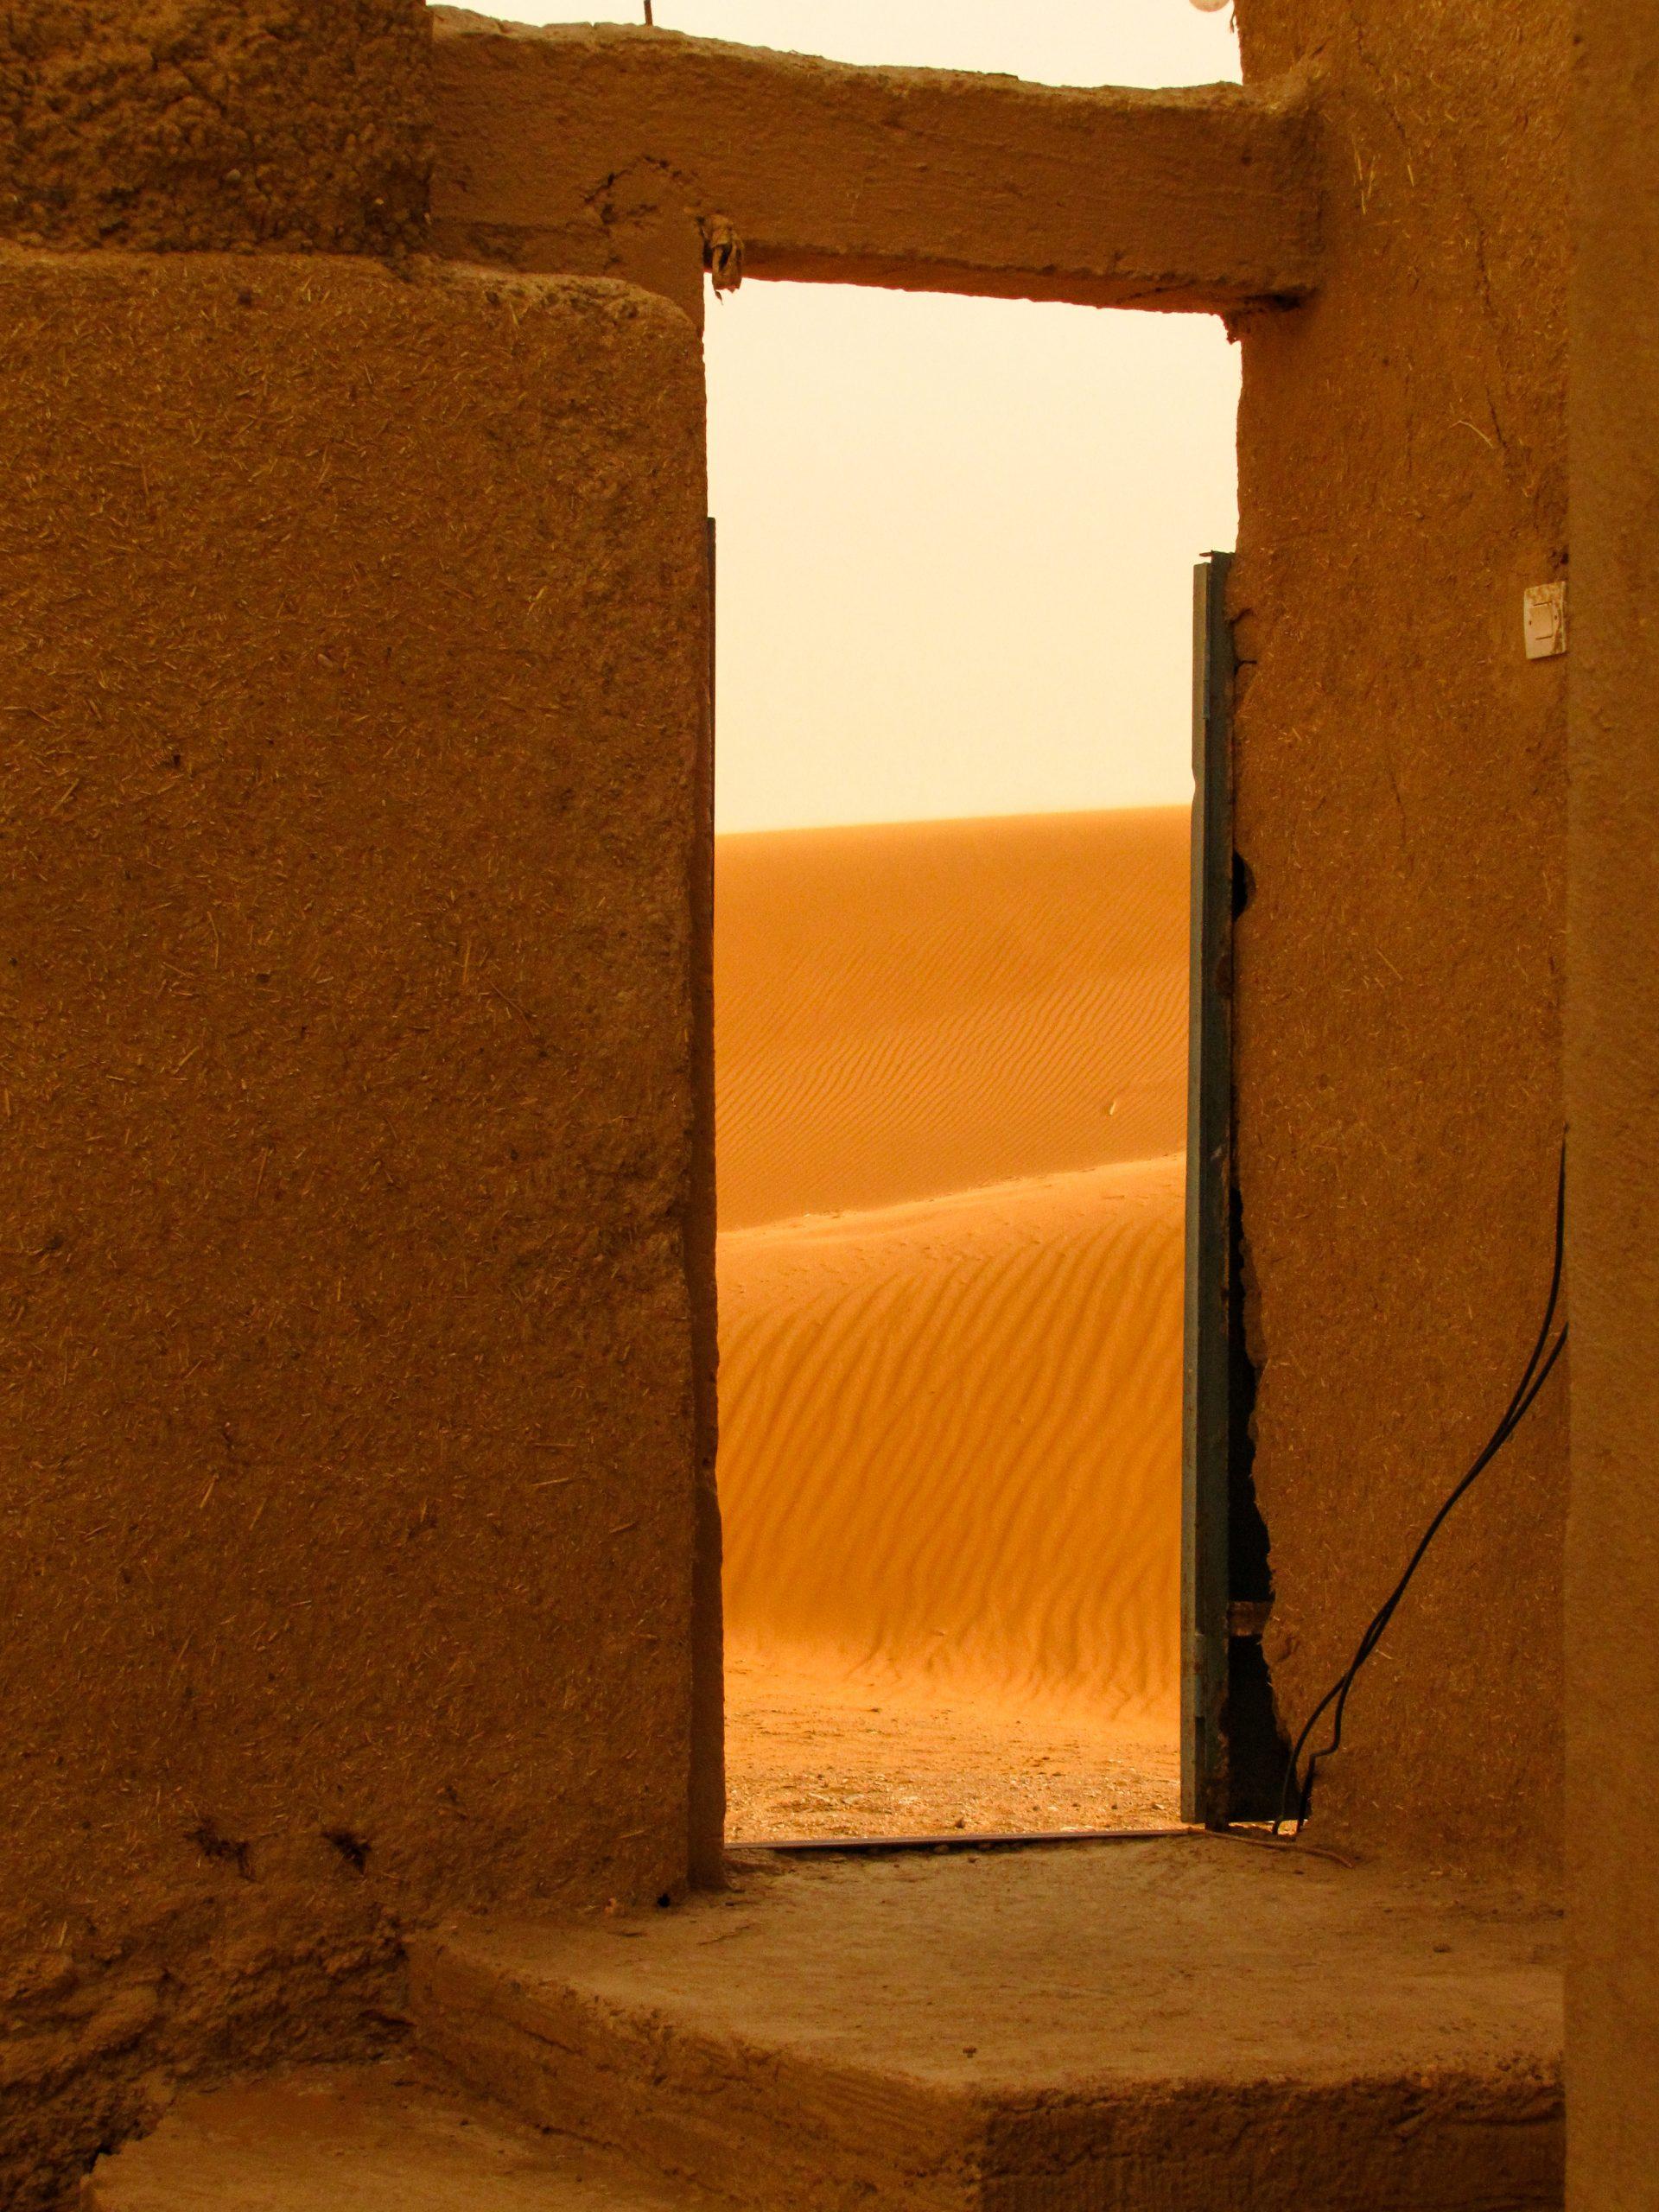 Western Sahara, Morocco, Africa